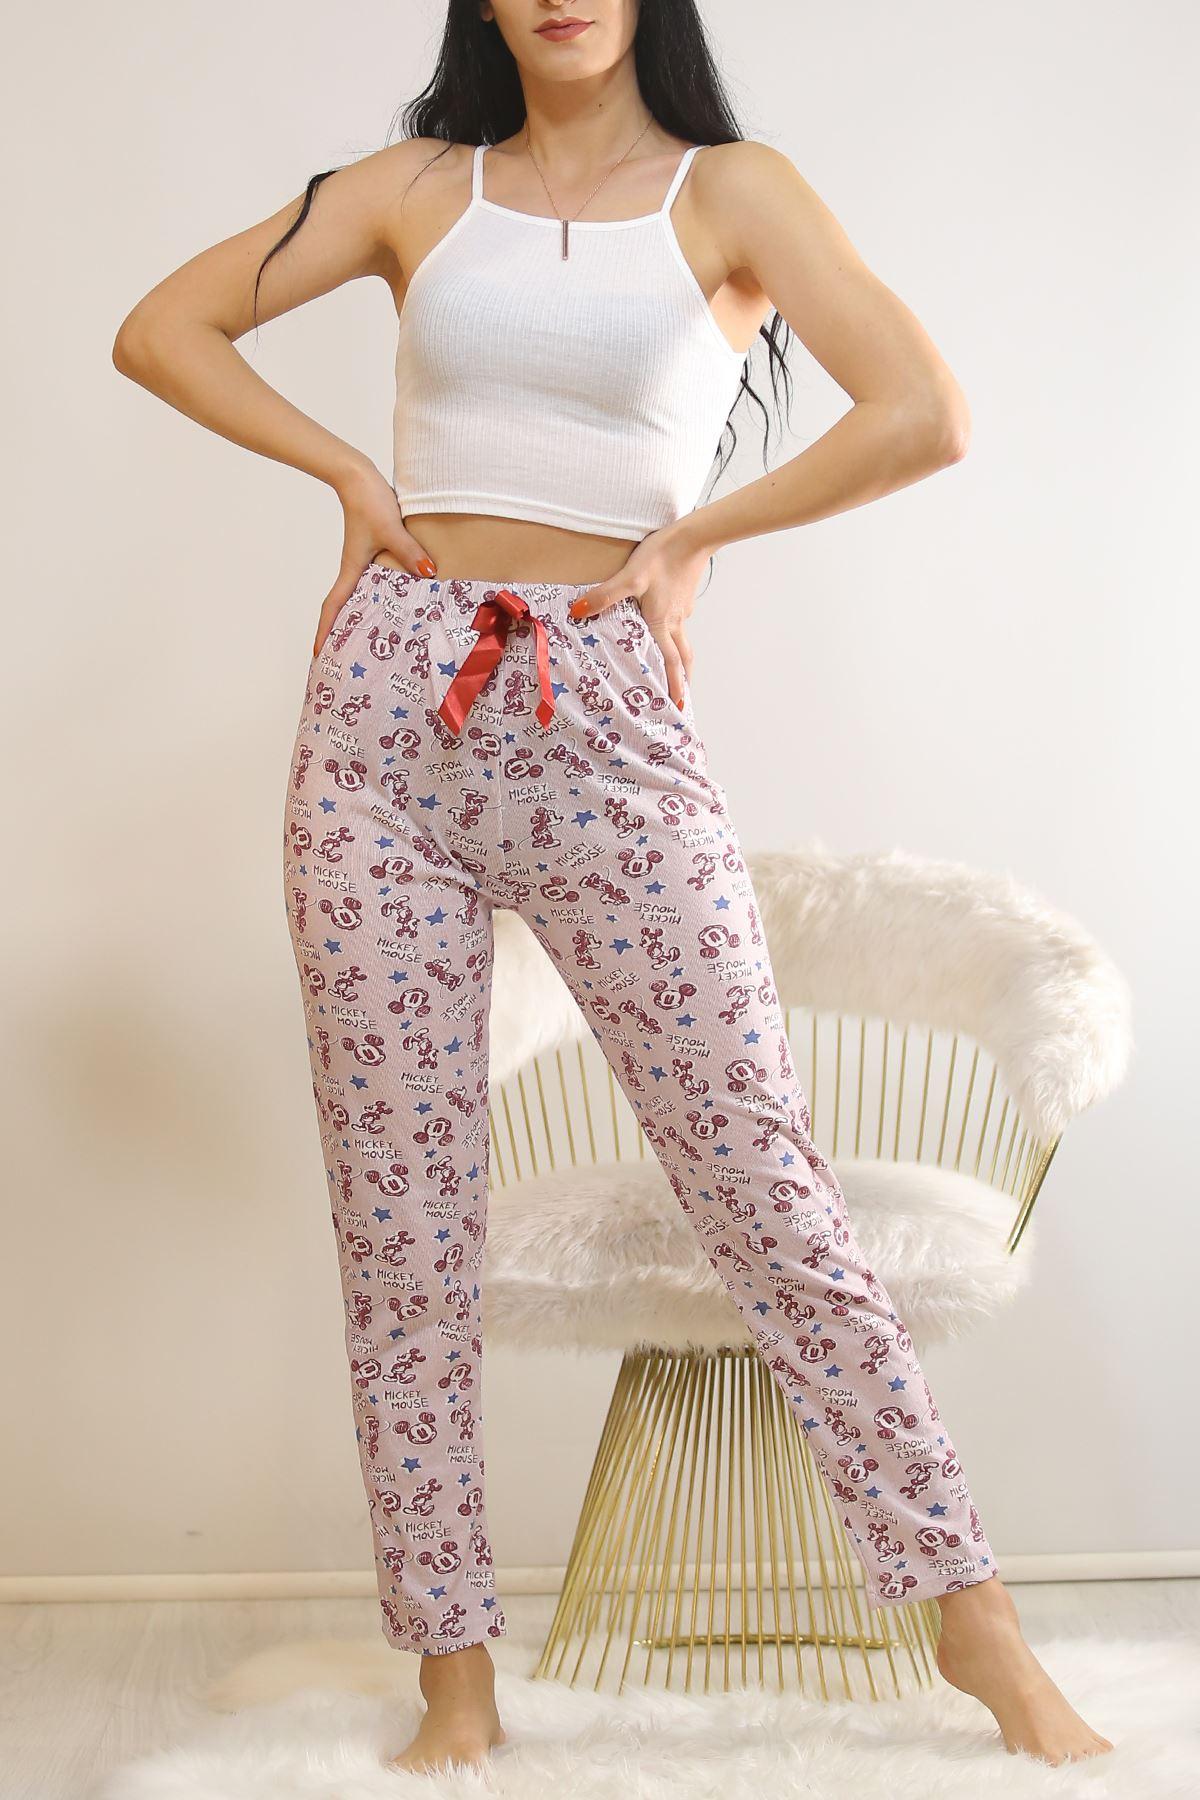 Desenli Pijama Altı Desenlibordo - 5518.919.